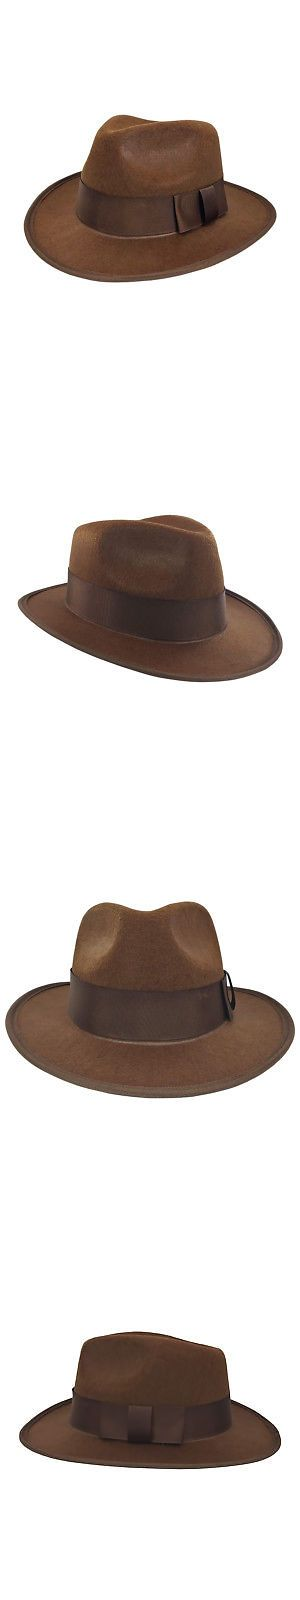 Hats and Headgear 155349  Indiana Jones Freddy Felt 4Th Doctor Who Fedora  Gangster Steampunk Hat Costume -  BUY IT NOW ONLY   10.45 on  eBay   headgear ... abe3cc559d22